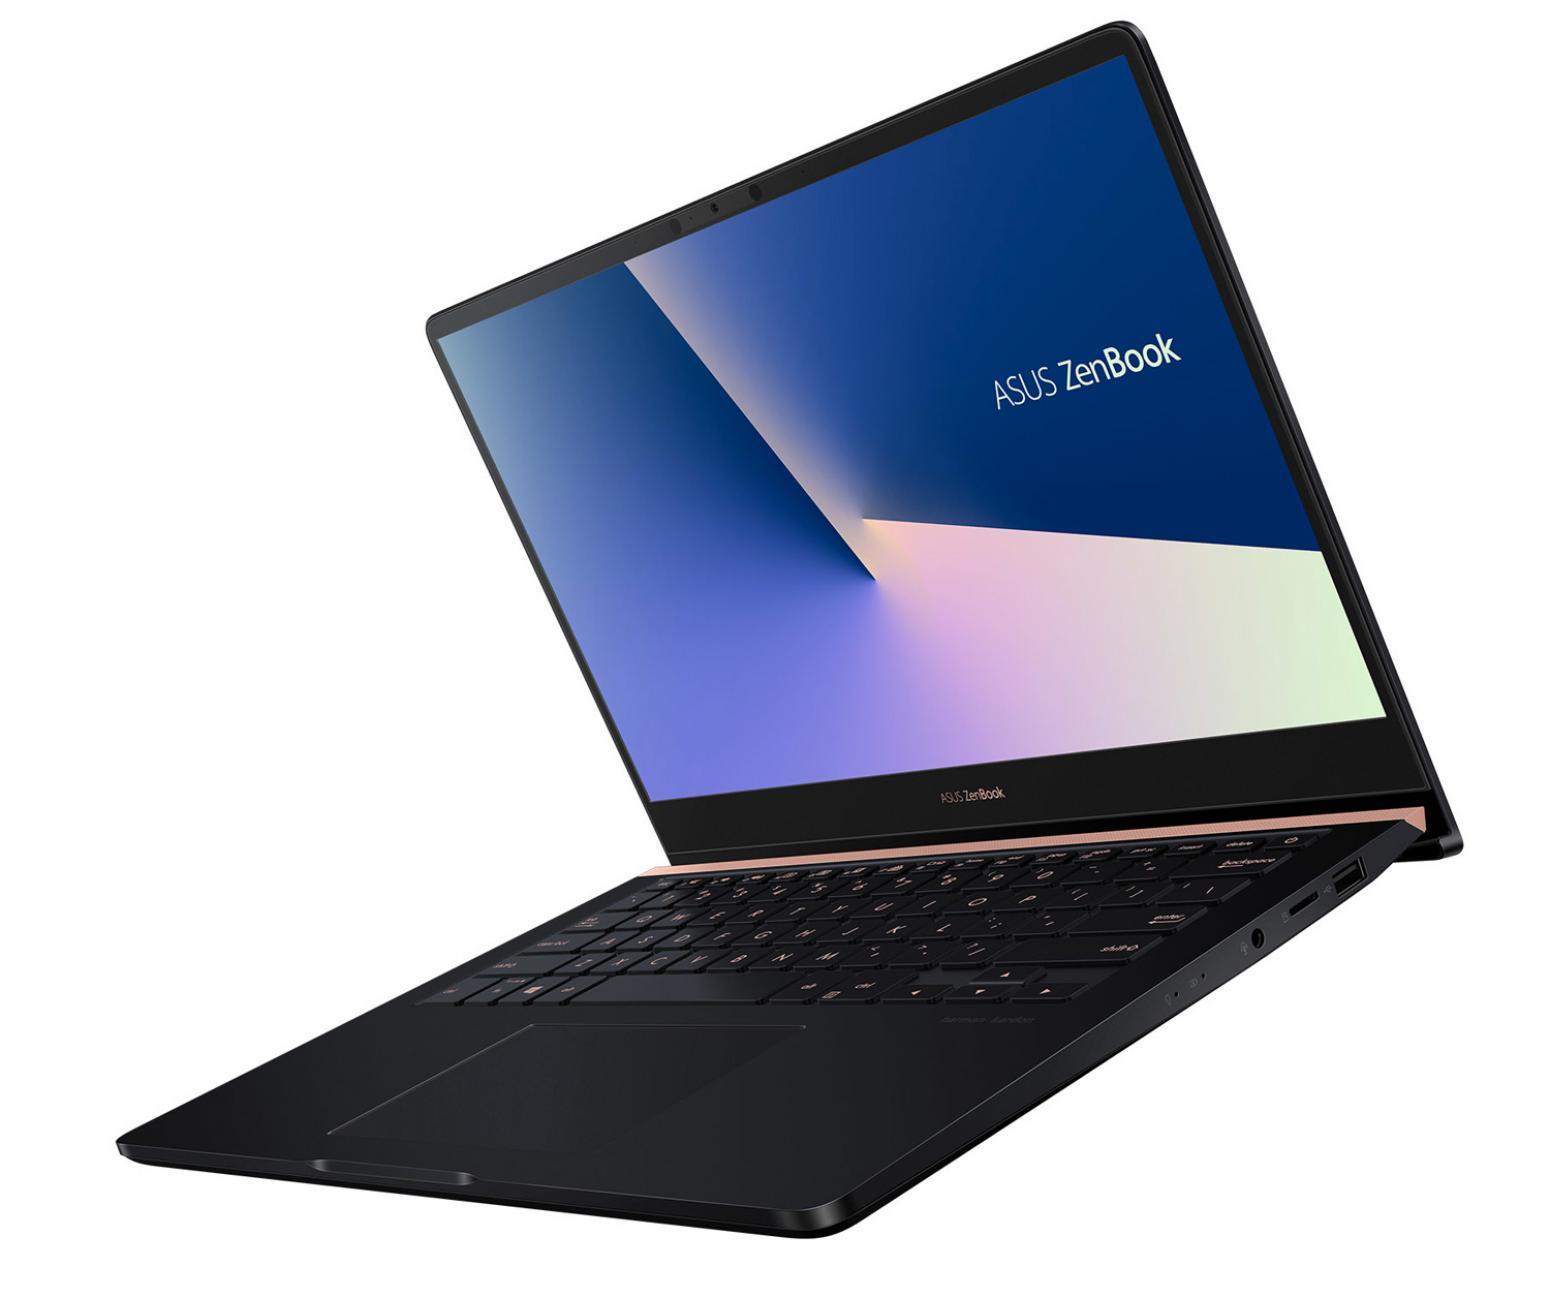 Ordinateur portable Asus ZenBook Pro UX450FD-BE049T - GTX 1050 Max-Q - photo 4